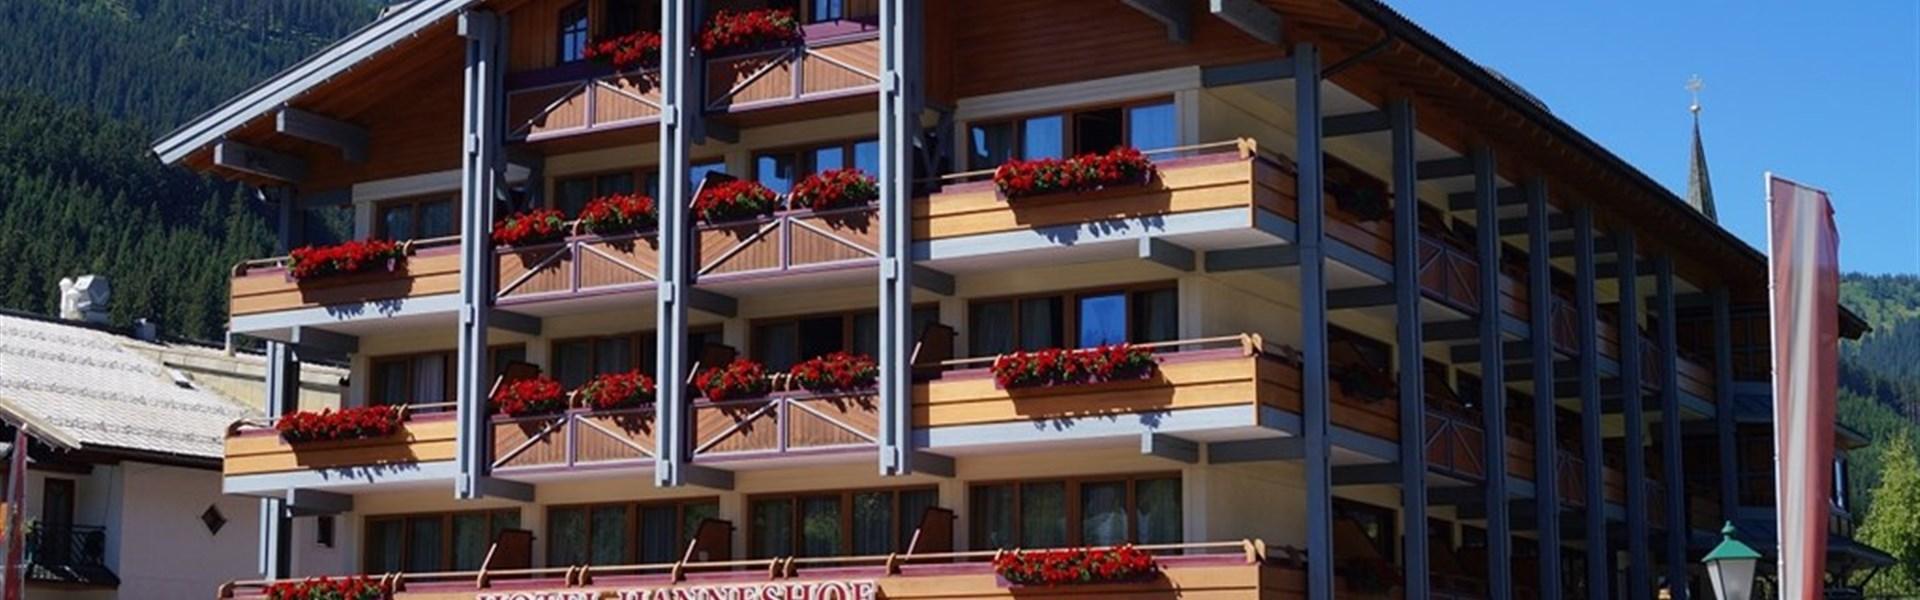 Marco Polo - Hanneshof Resort -